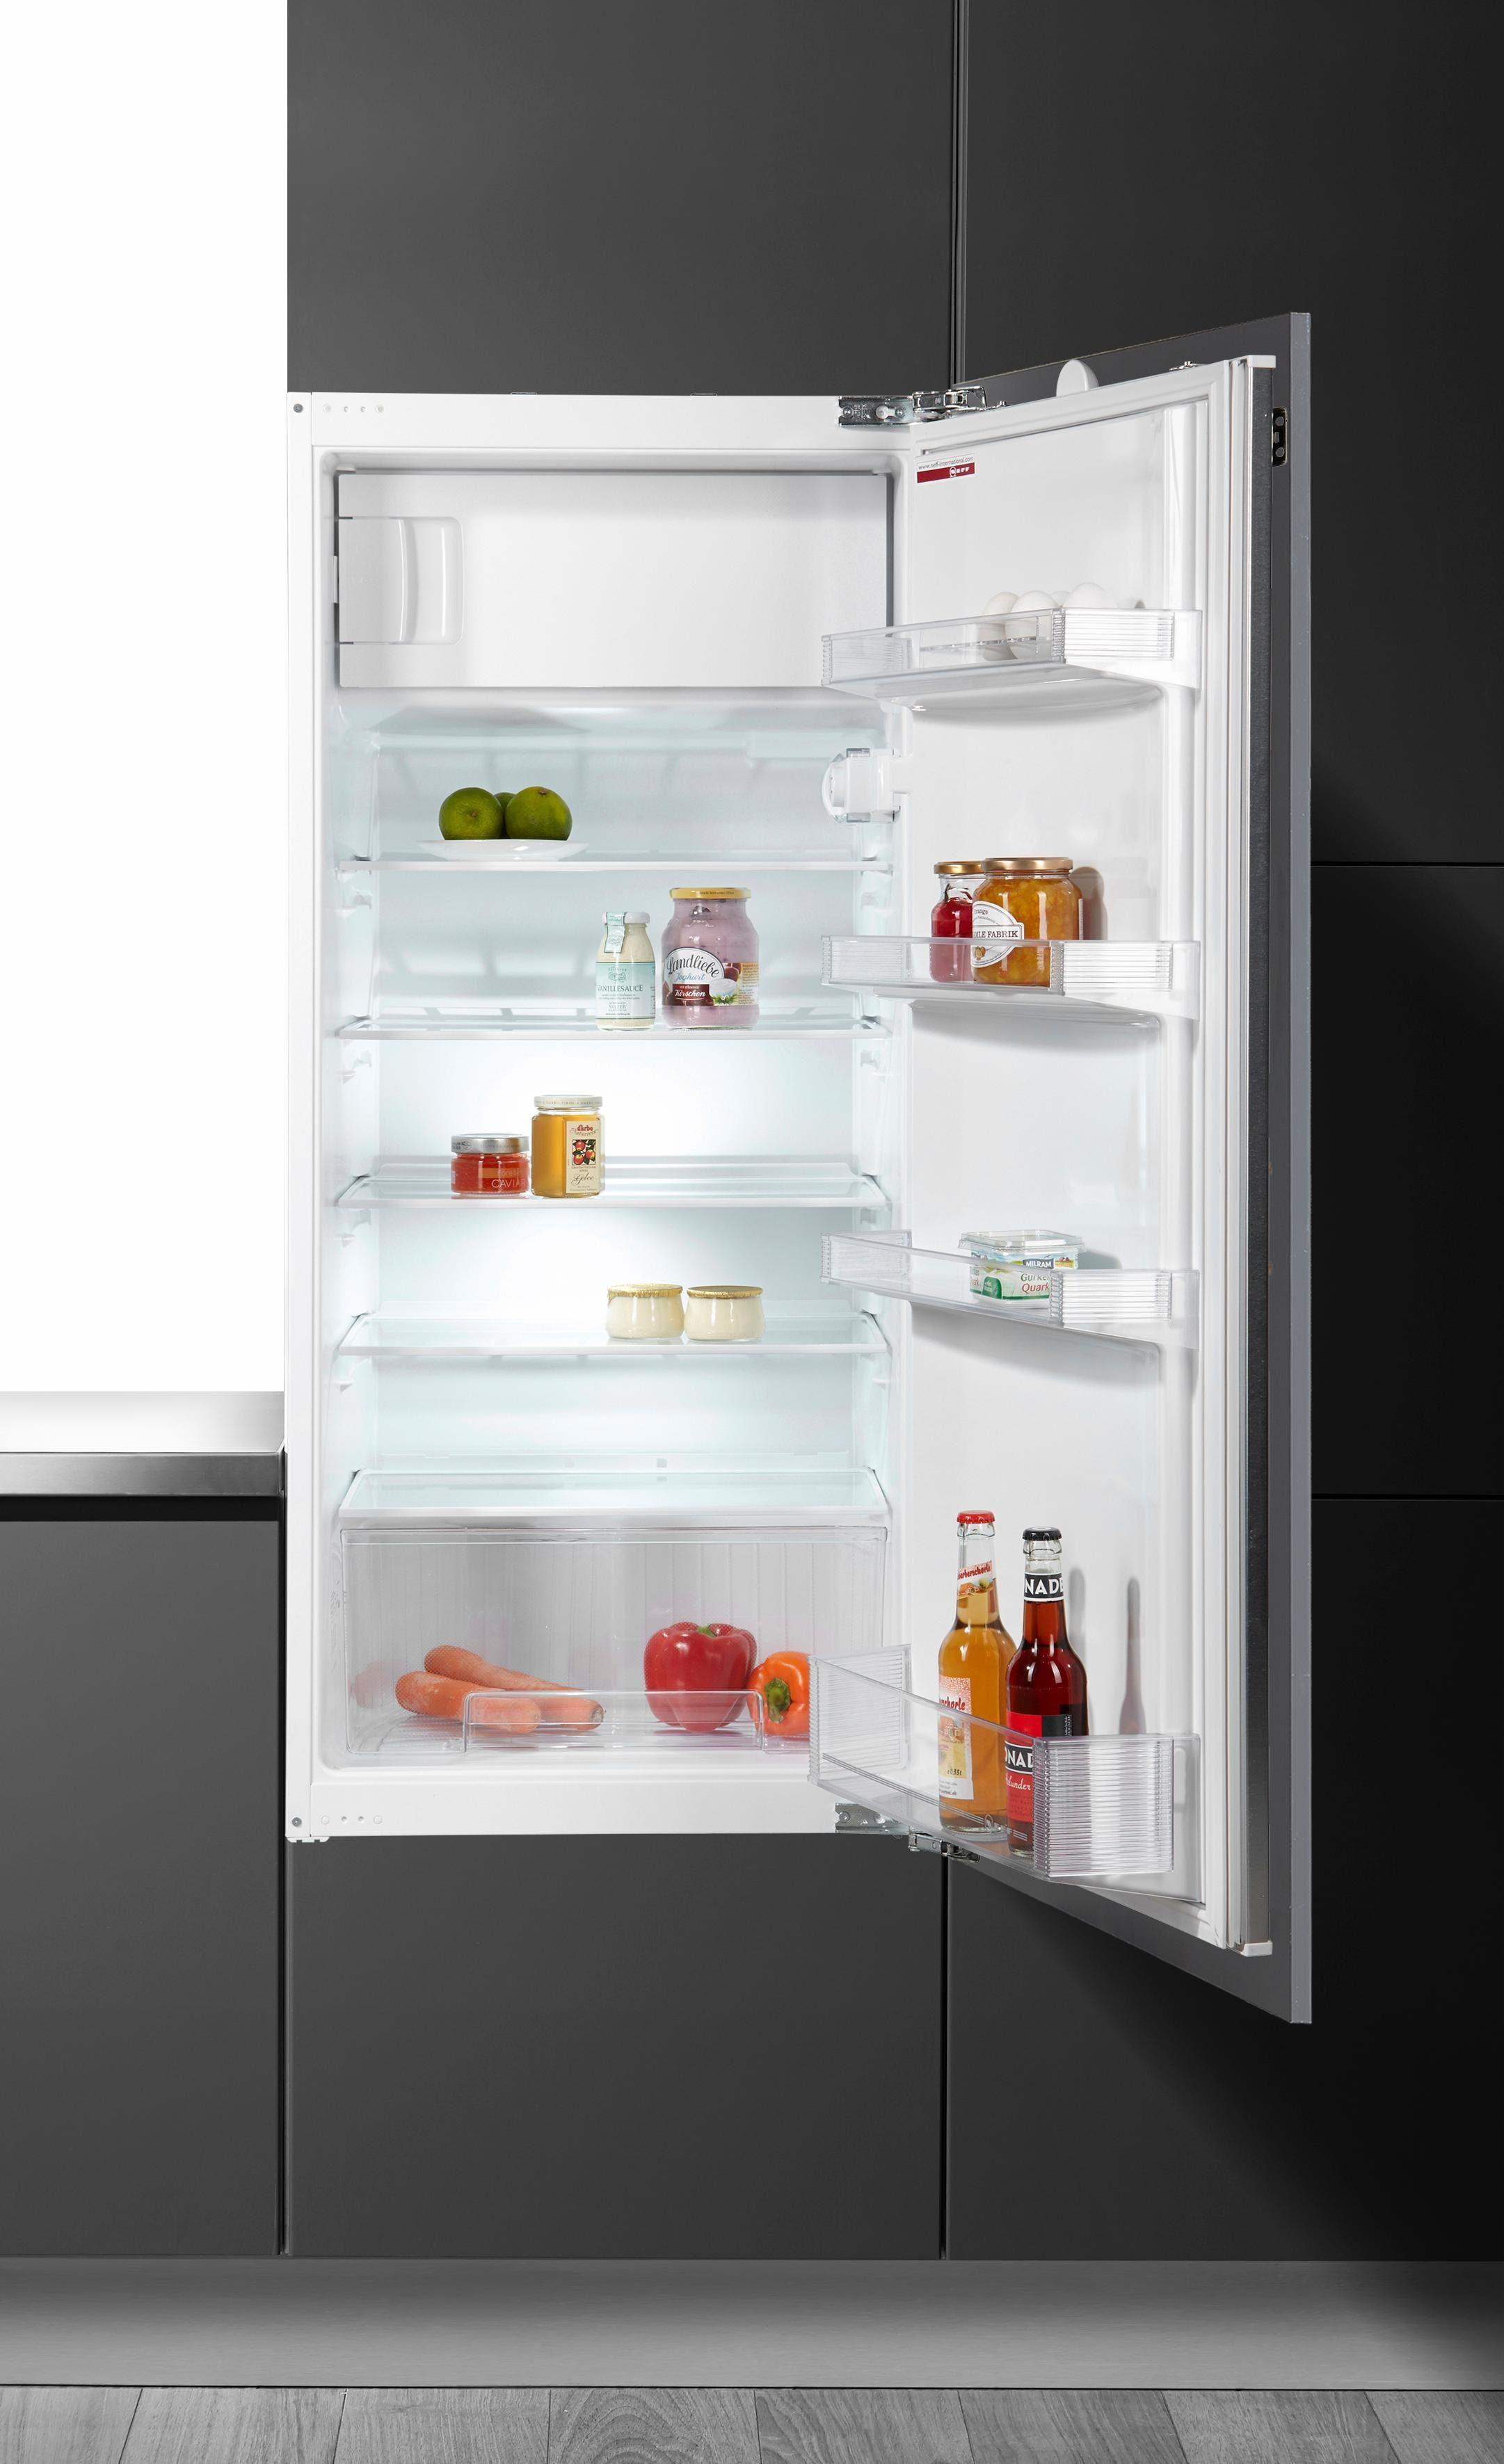 Neff Integrierbarer Einbau-Kühlschrank K 425 A1 / K1554X7, A+, 122,1 cm hoch